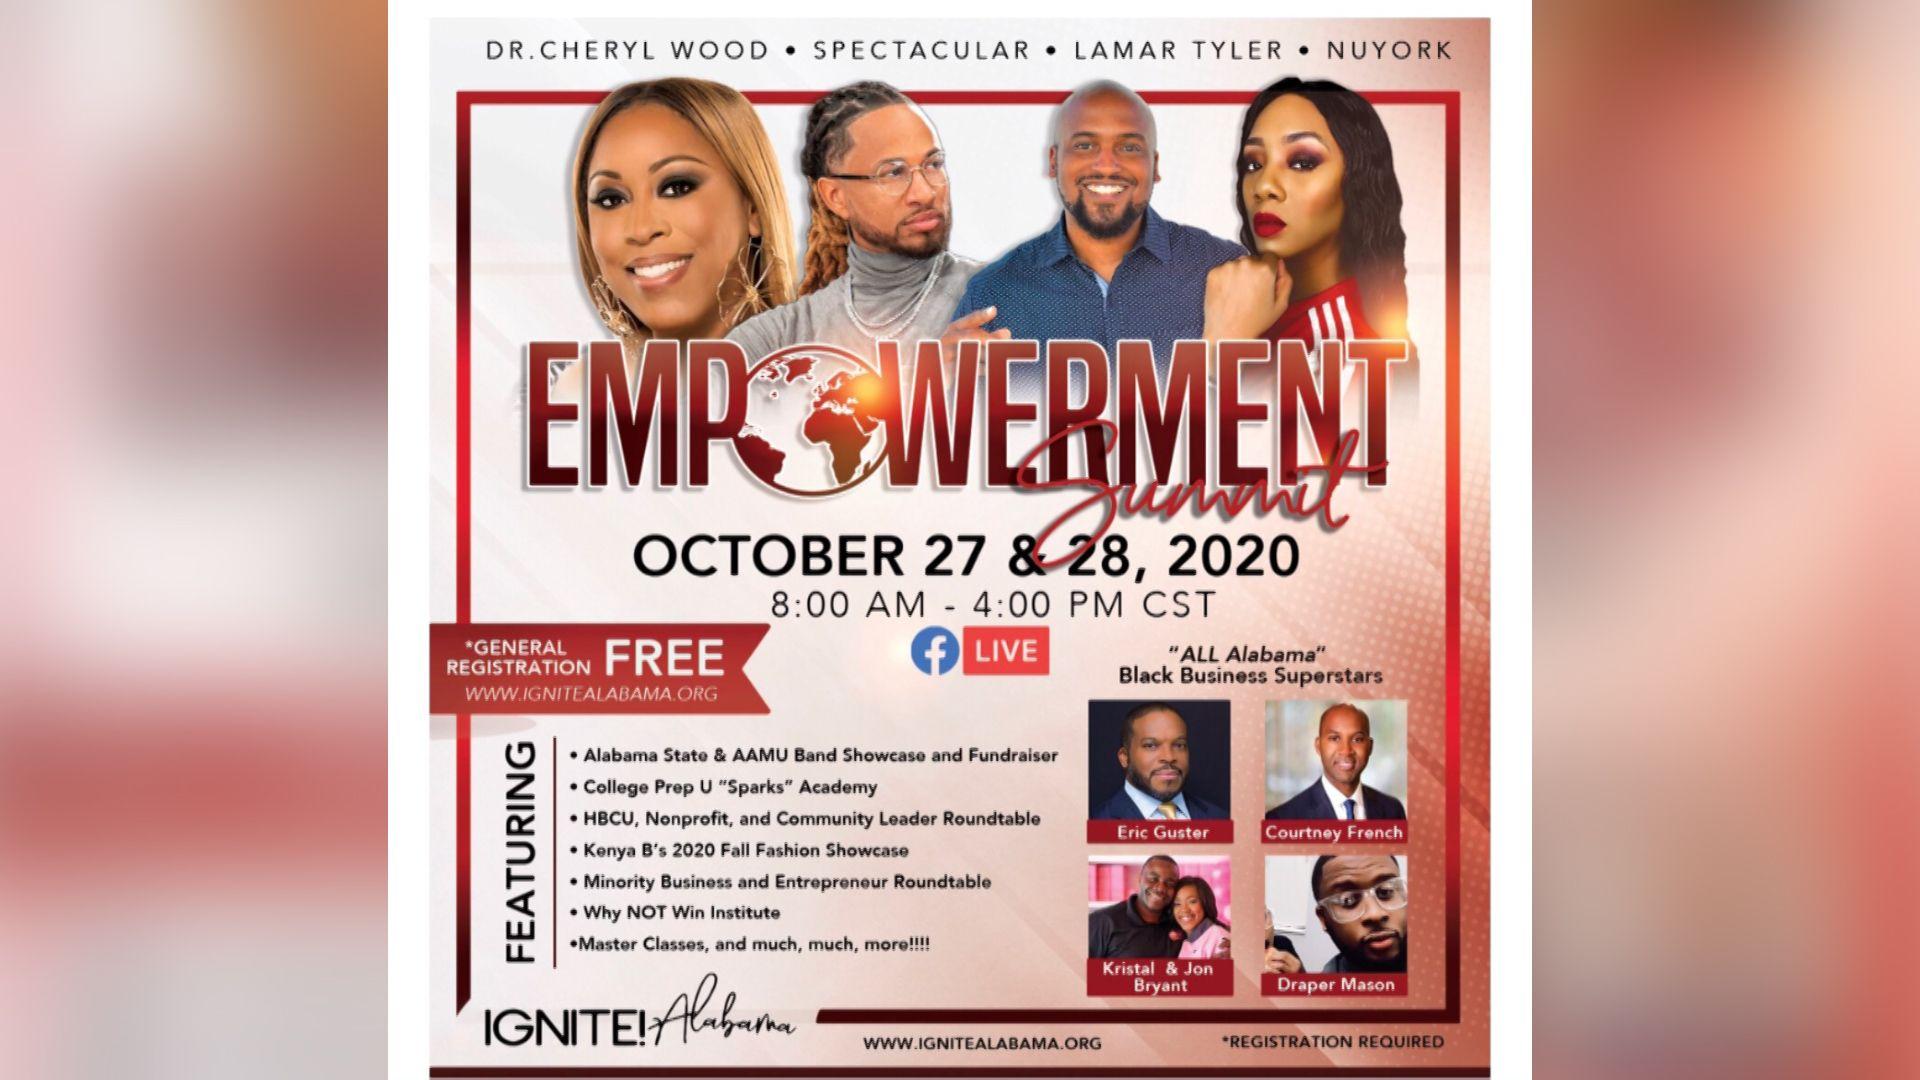 IGNITE! Alabama to host 2020 Virtual Empowerment Summit